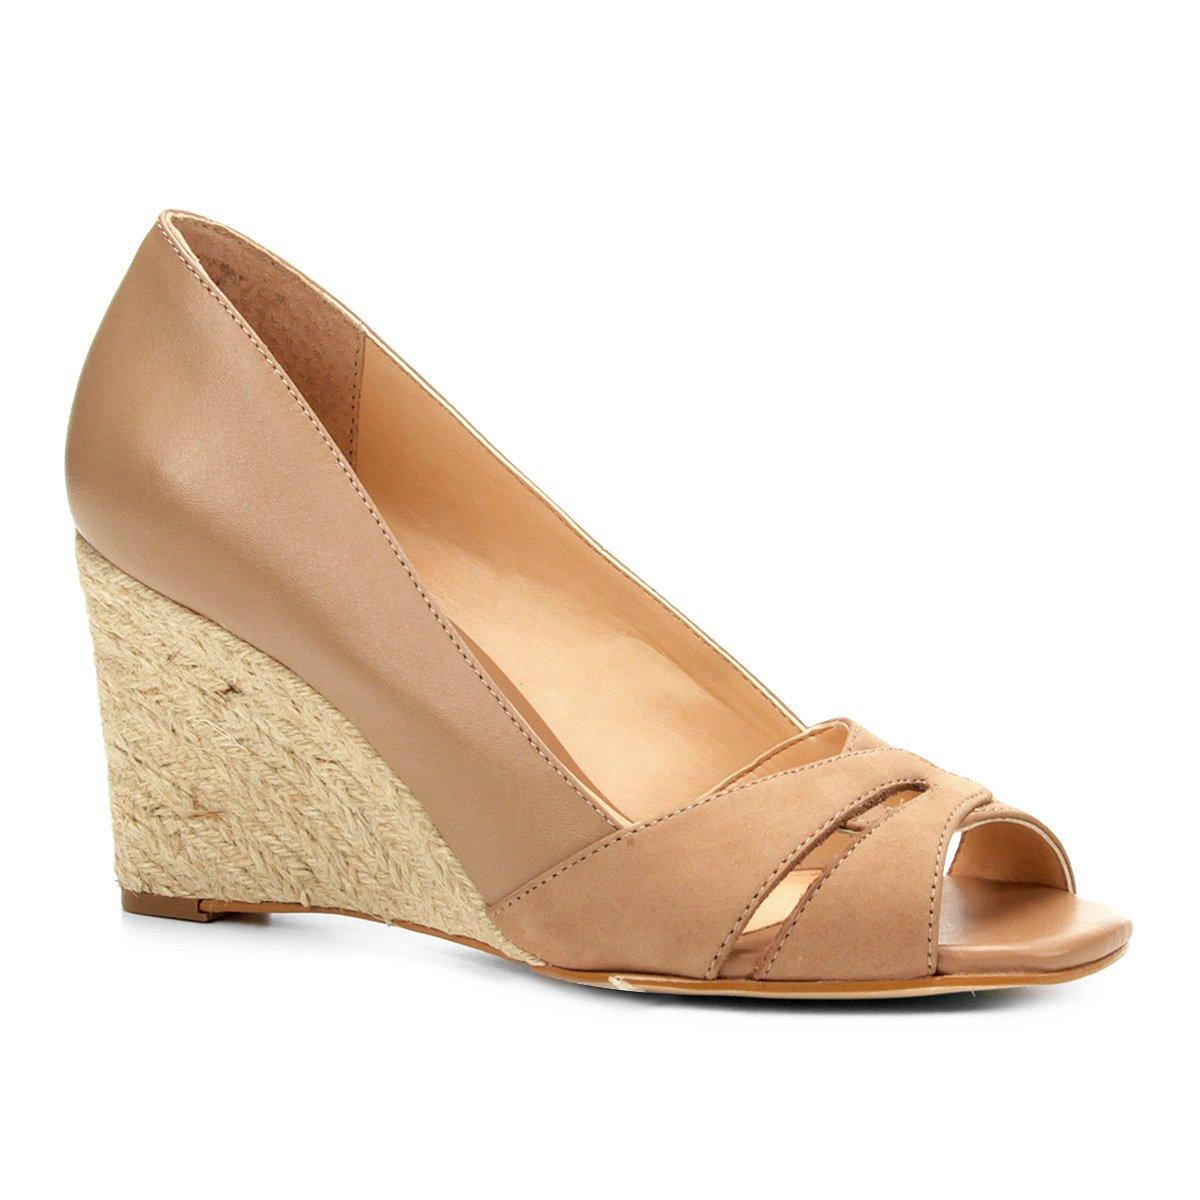 d926e6c740 Peep Toe Anabela Shoestock Corda Mix Couros - Nude